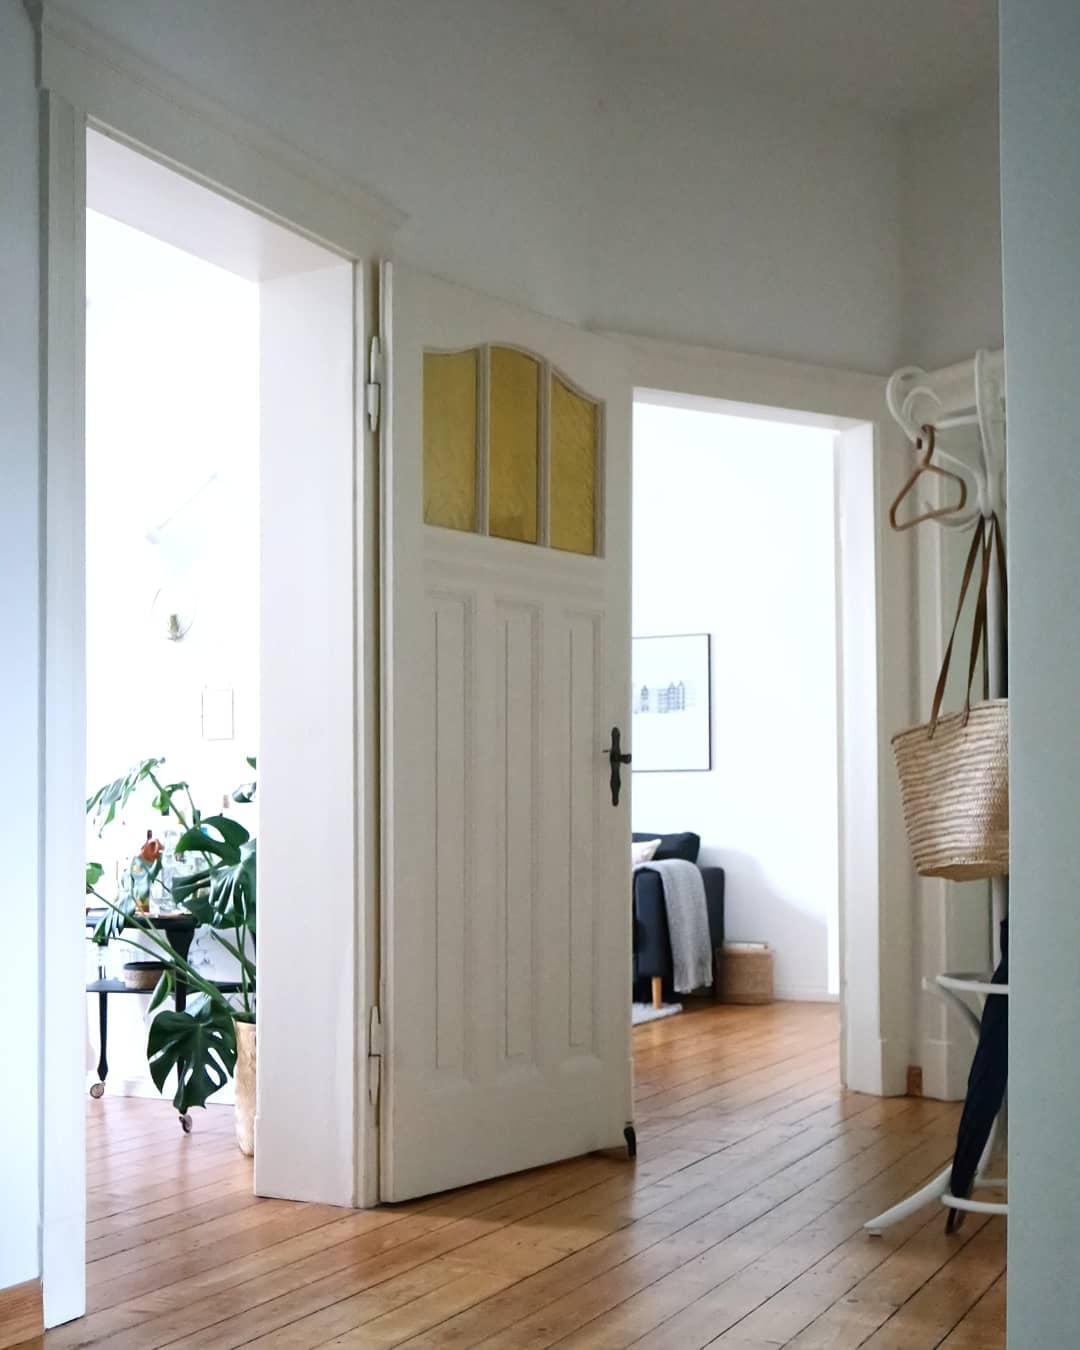 holztreppe bilder ideen couch. Black Bedroom Furniture Sets. Home Design Ideas